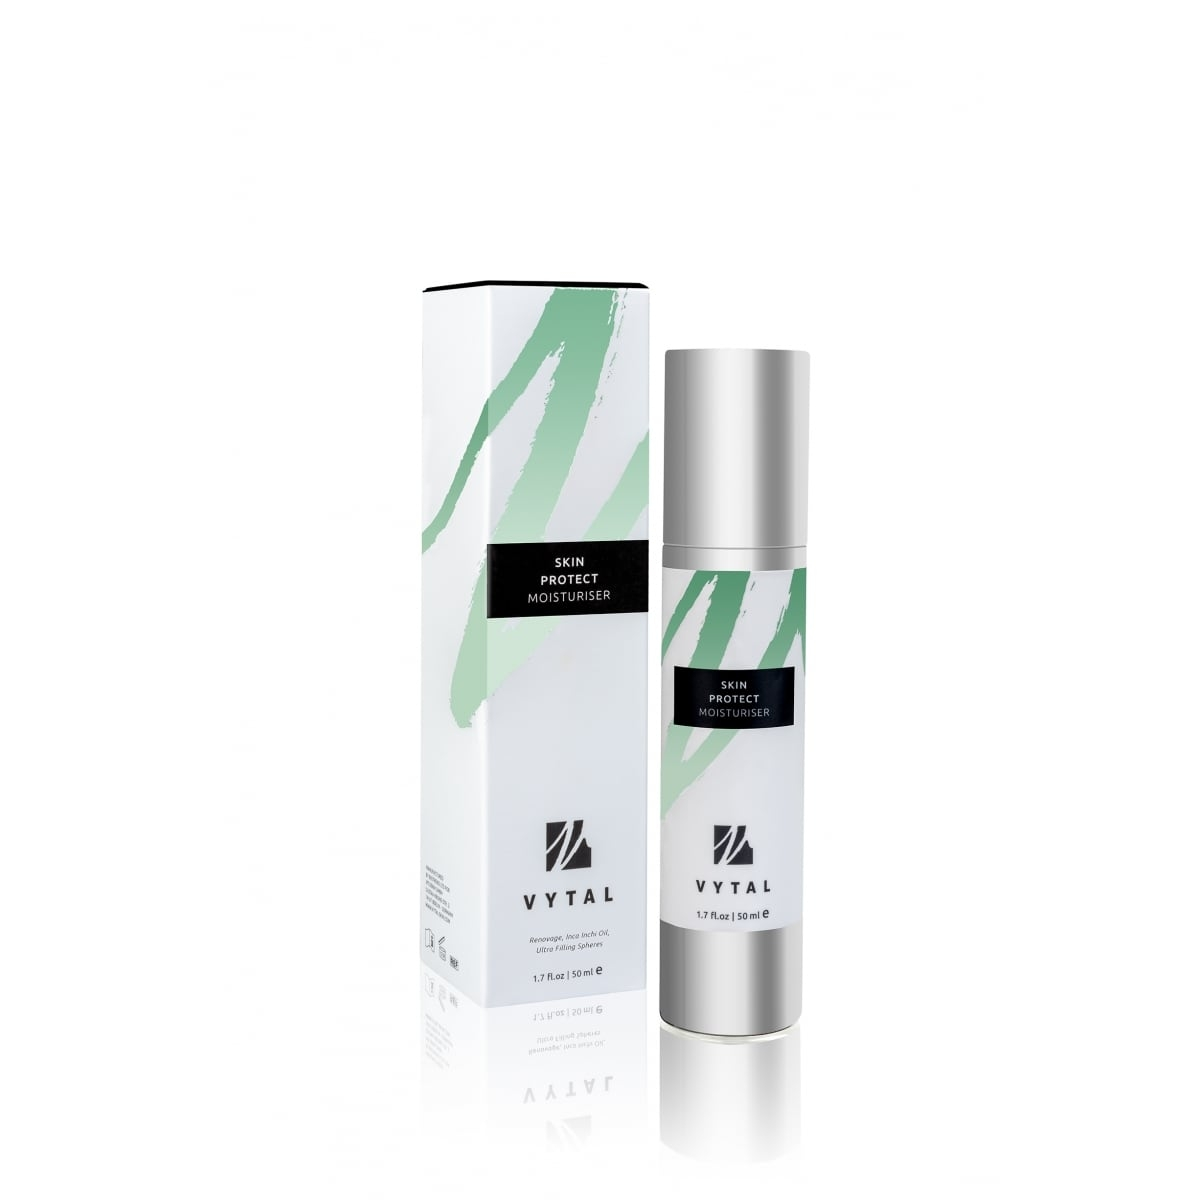 Soins beauté -  - SKIN PROTECT MOISTURISER (50 ml)